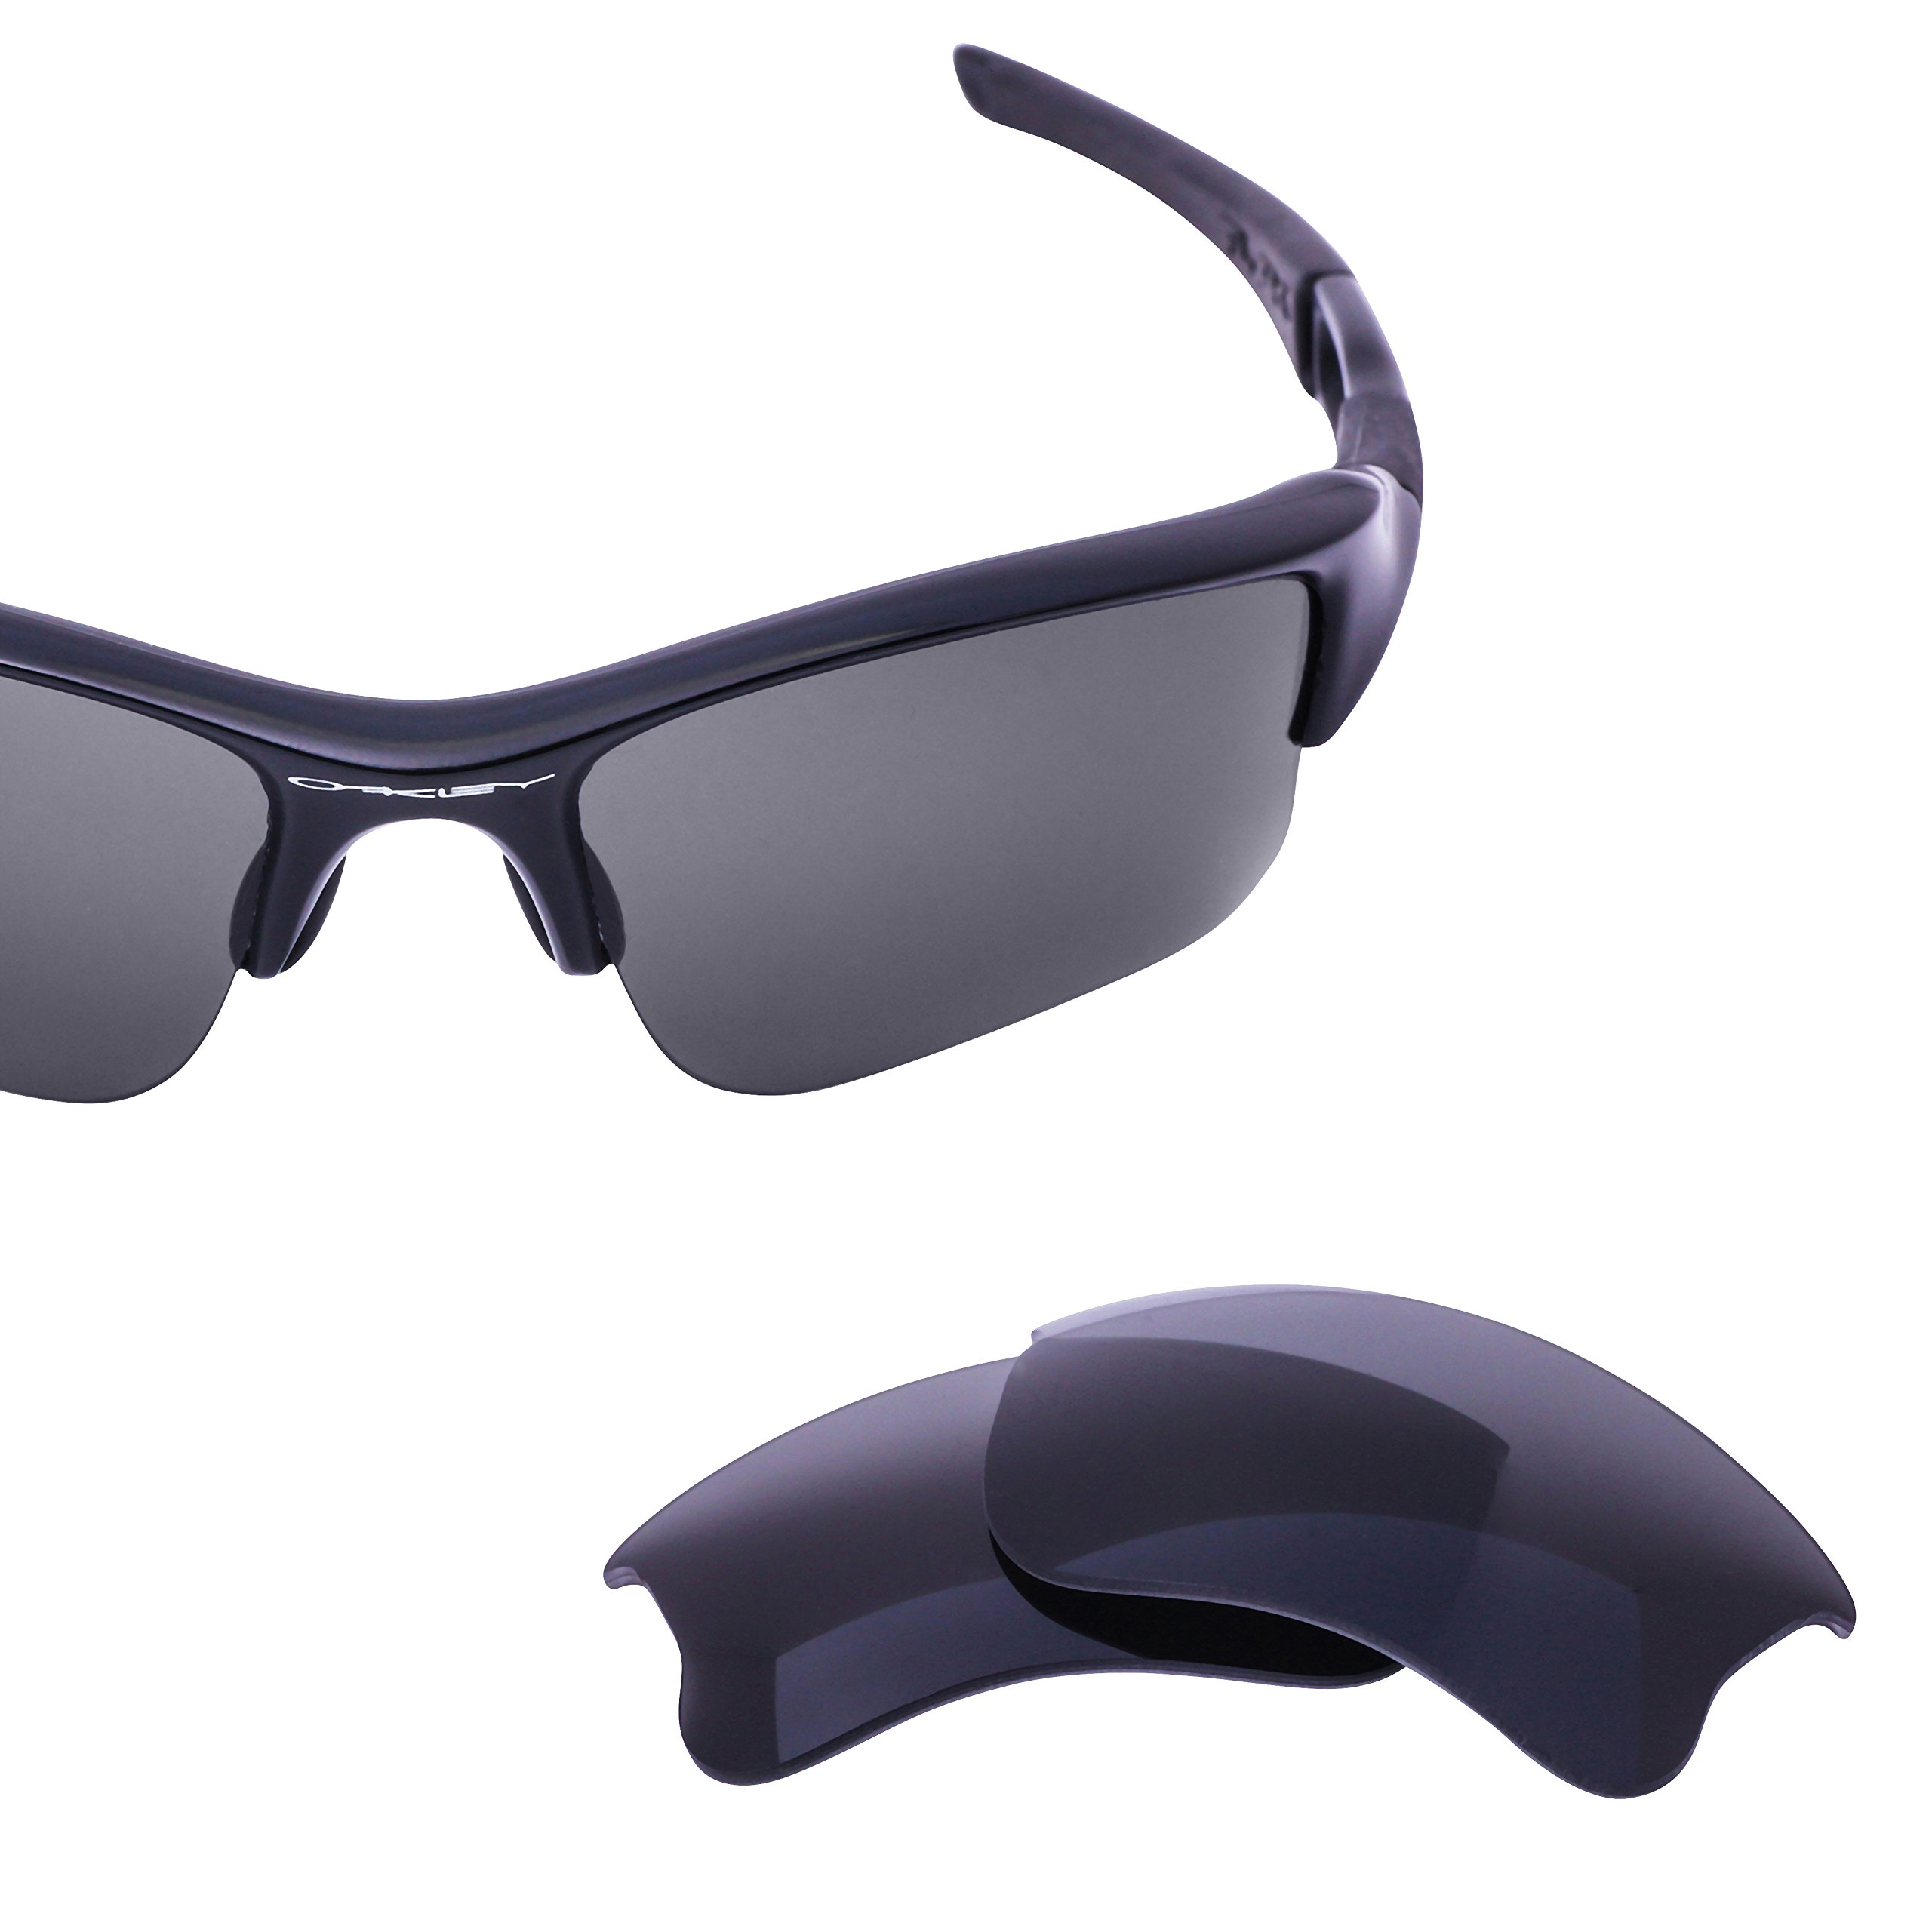 LenzFlip Replacement Lenses for Oakley FLAK Jacket XLJ Sunglass - Gray Black Polarized Lenses by LenzFlip